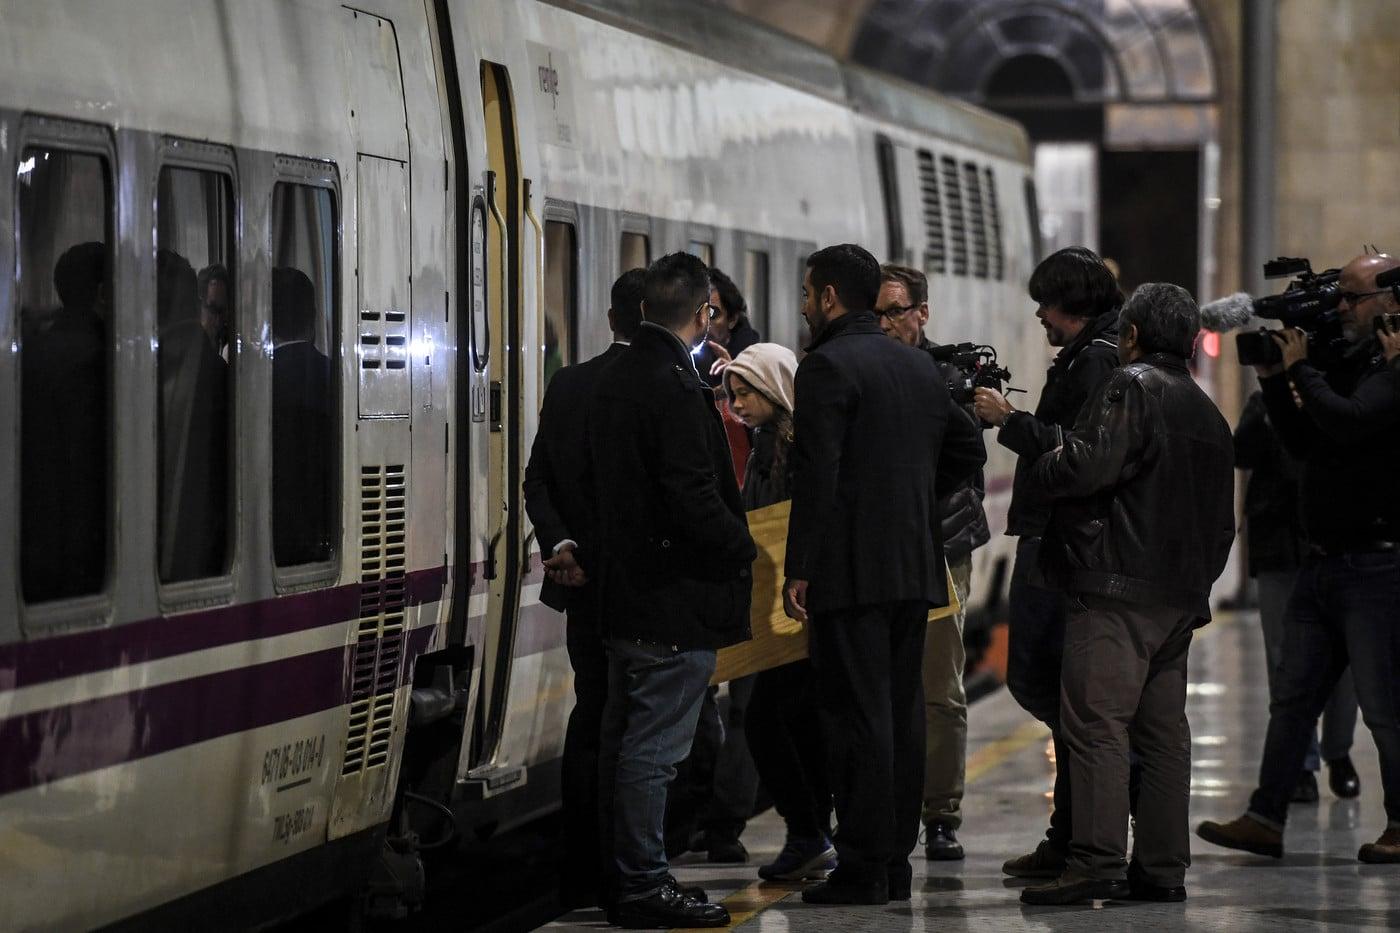 jeune activiste suedoise Gretha Thunberg embarque train nuitMadrid Santa Apolonia Lisbonne 5 decembre 2019 1 1400 933